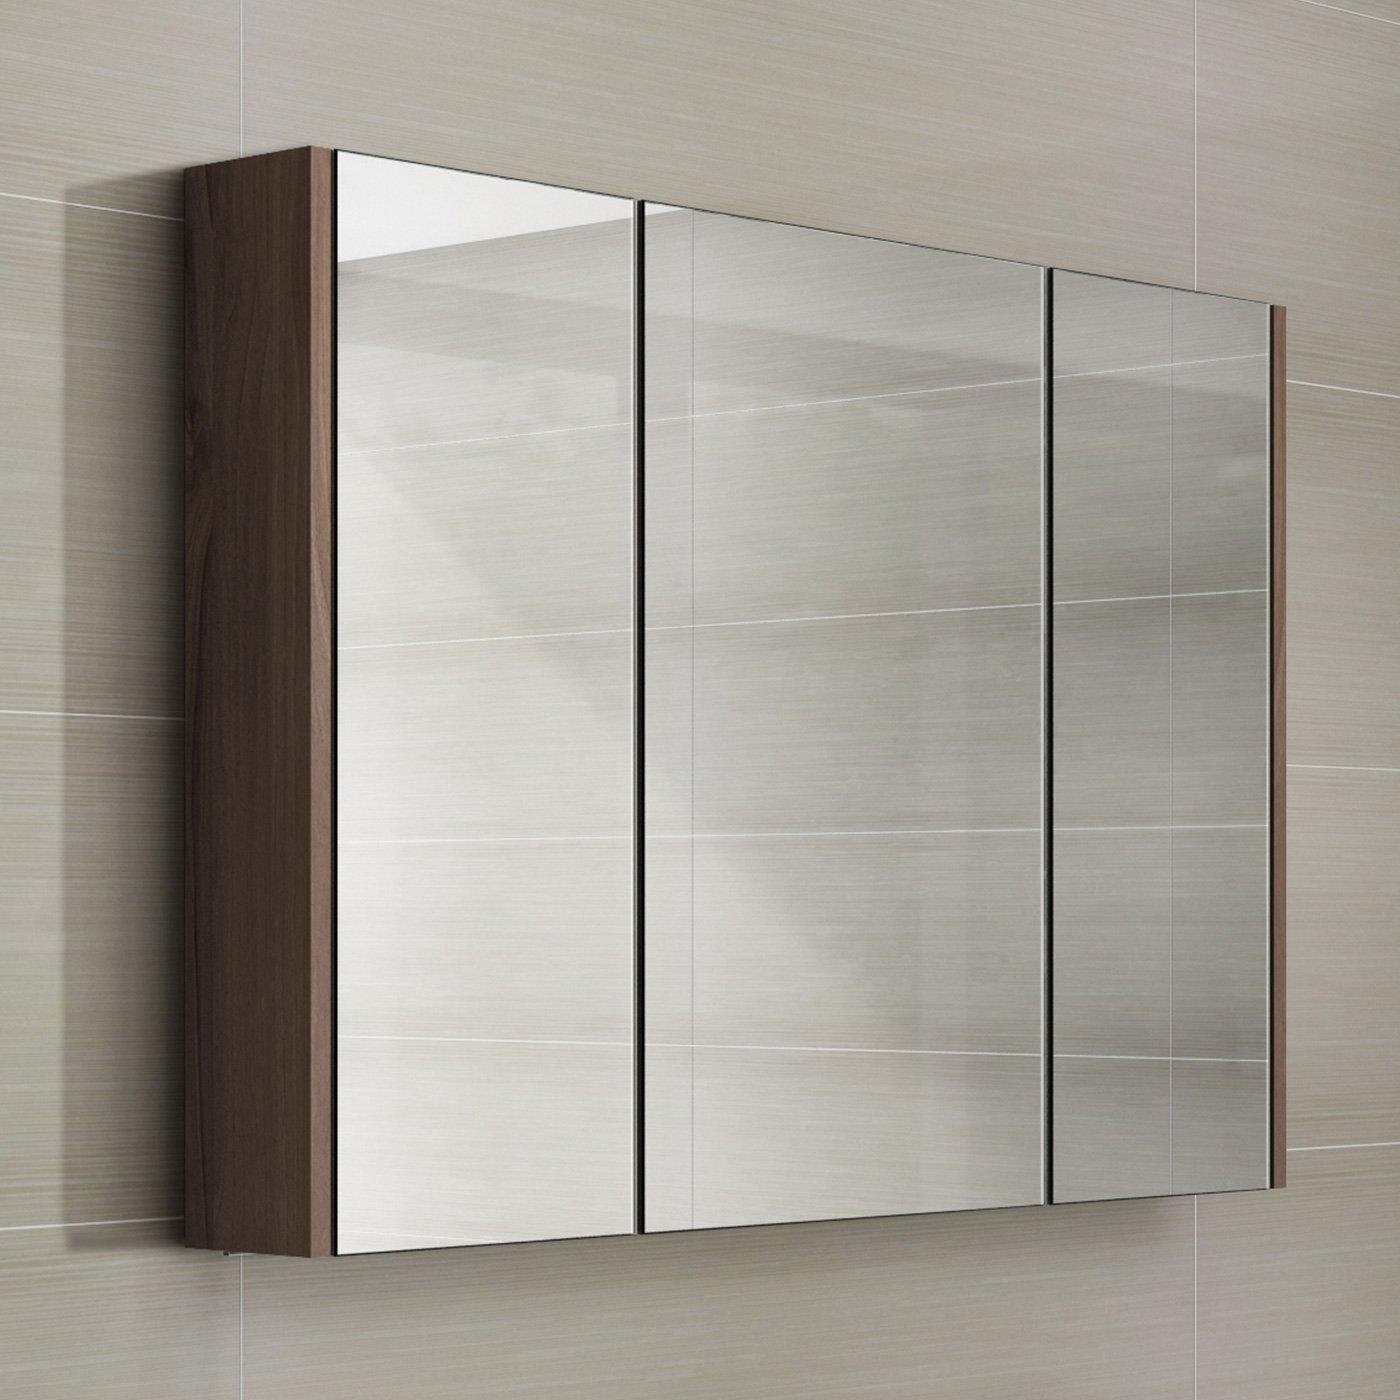 Walnut Bathroom Cabinet: Amazon.co.uk